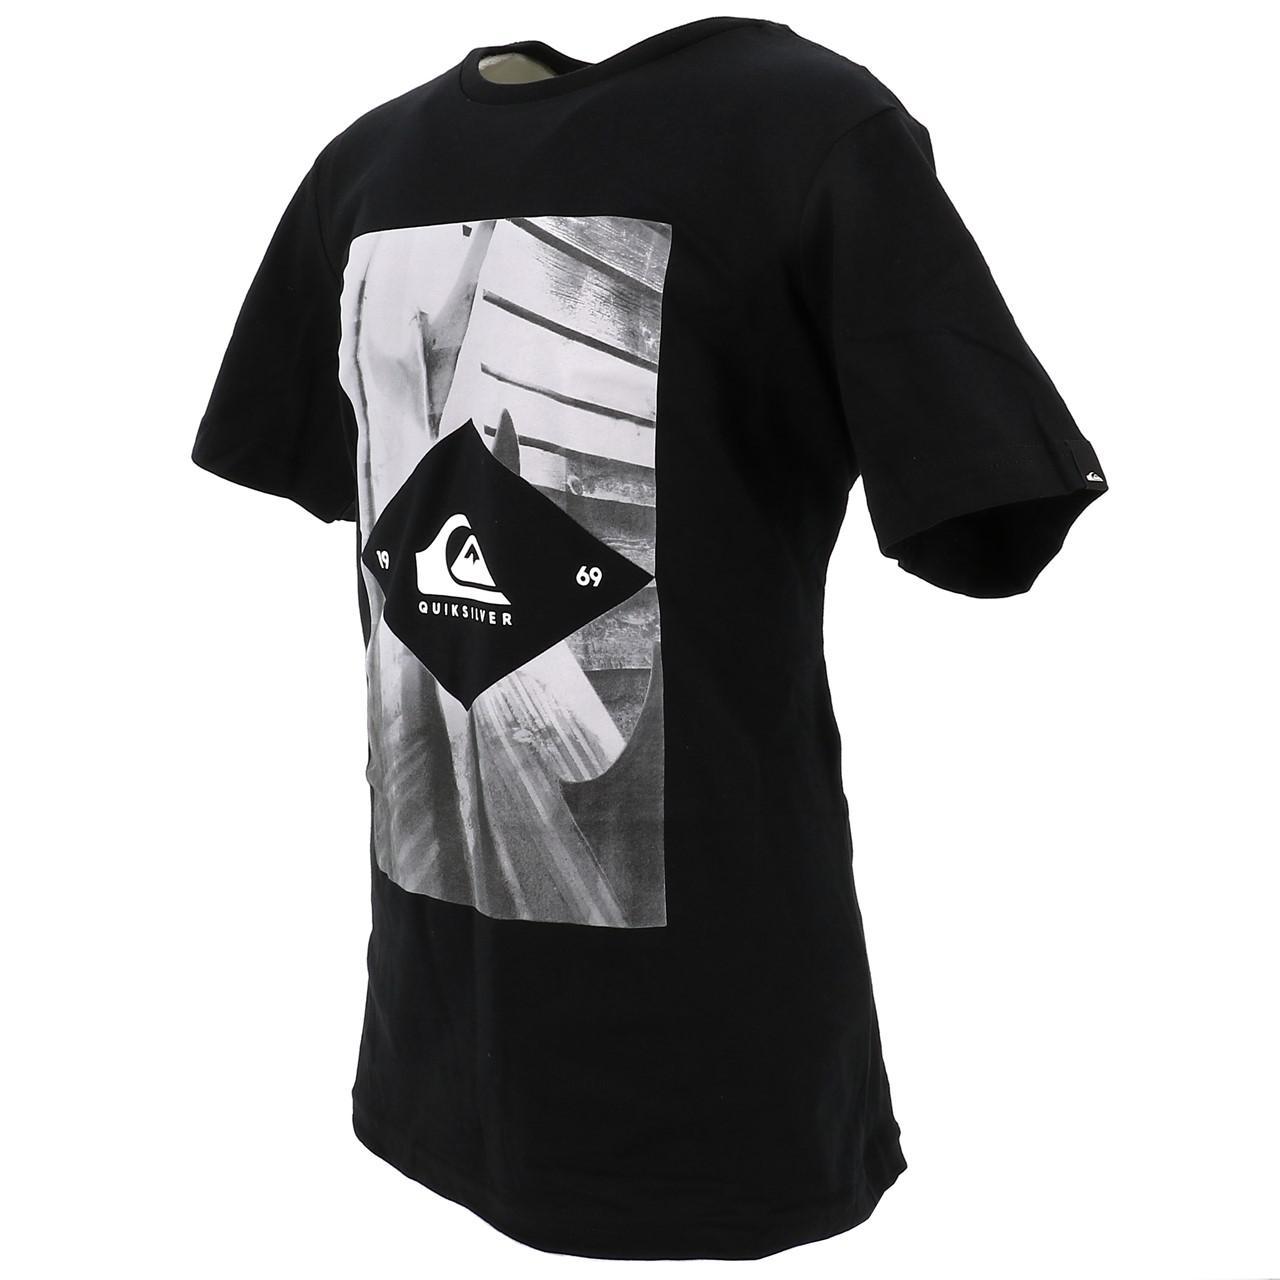 Tee-shirt-manches-courtes-Quiksilver-15341-flaxton-blk-jr-sp2-Noir-17517-Neuf miniature 4